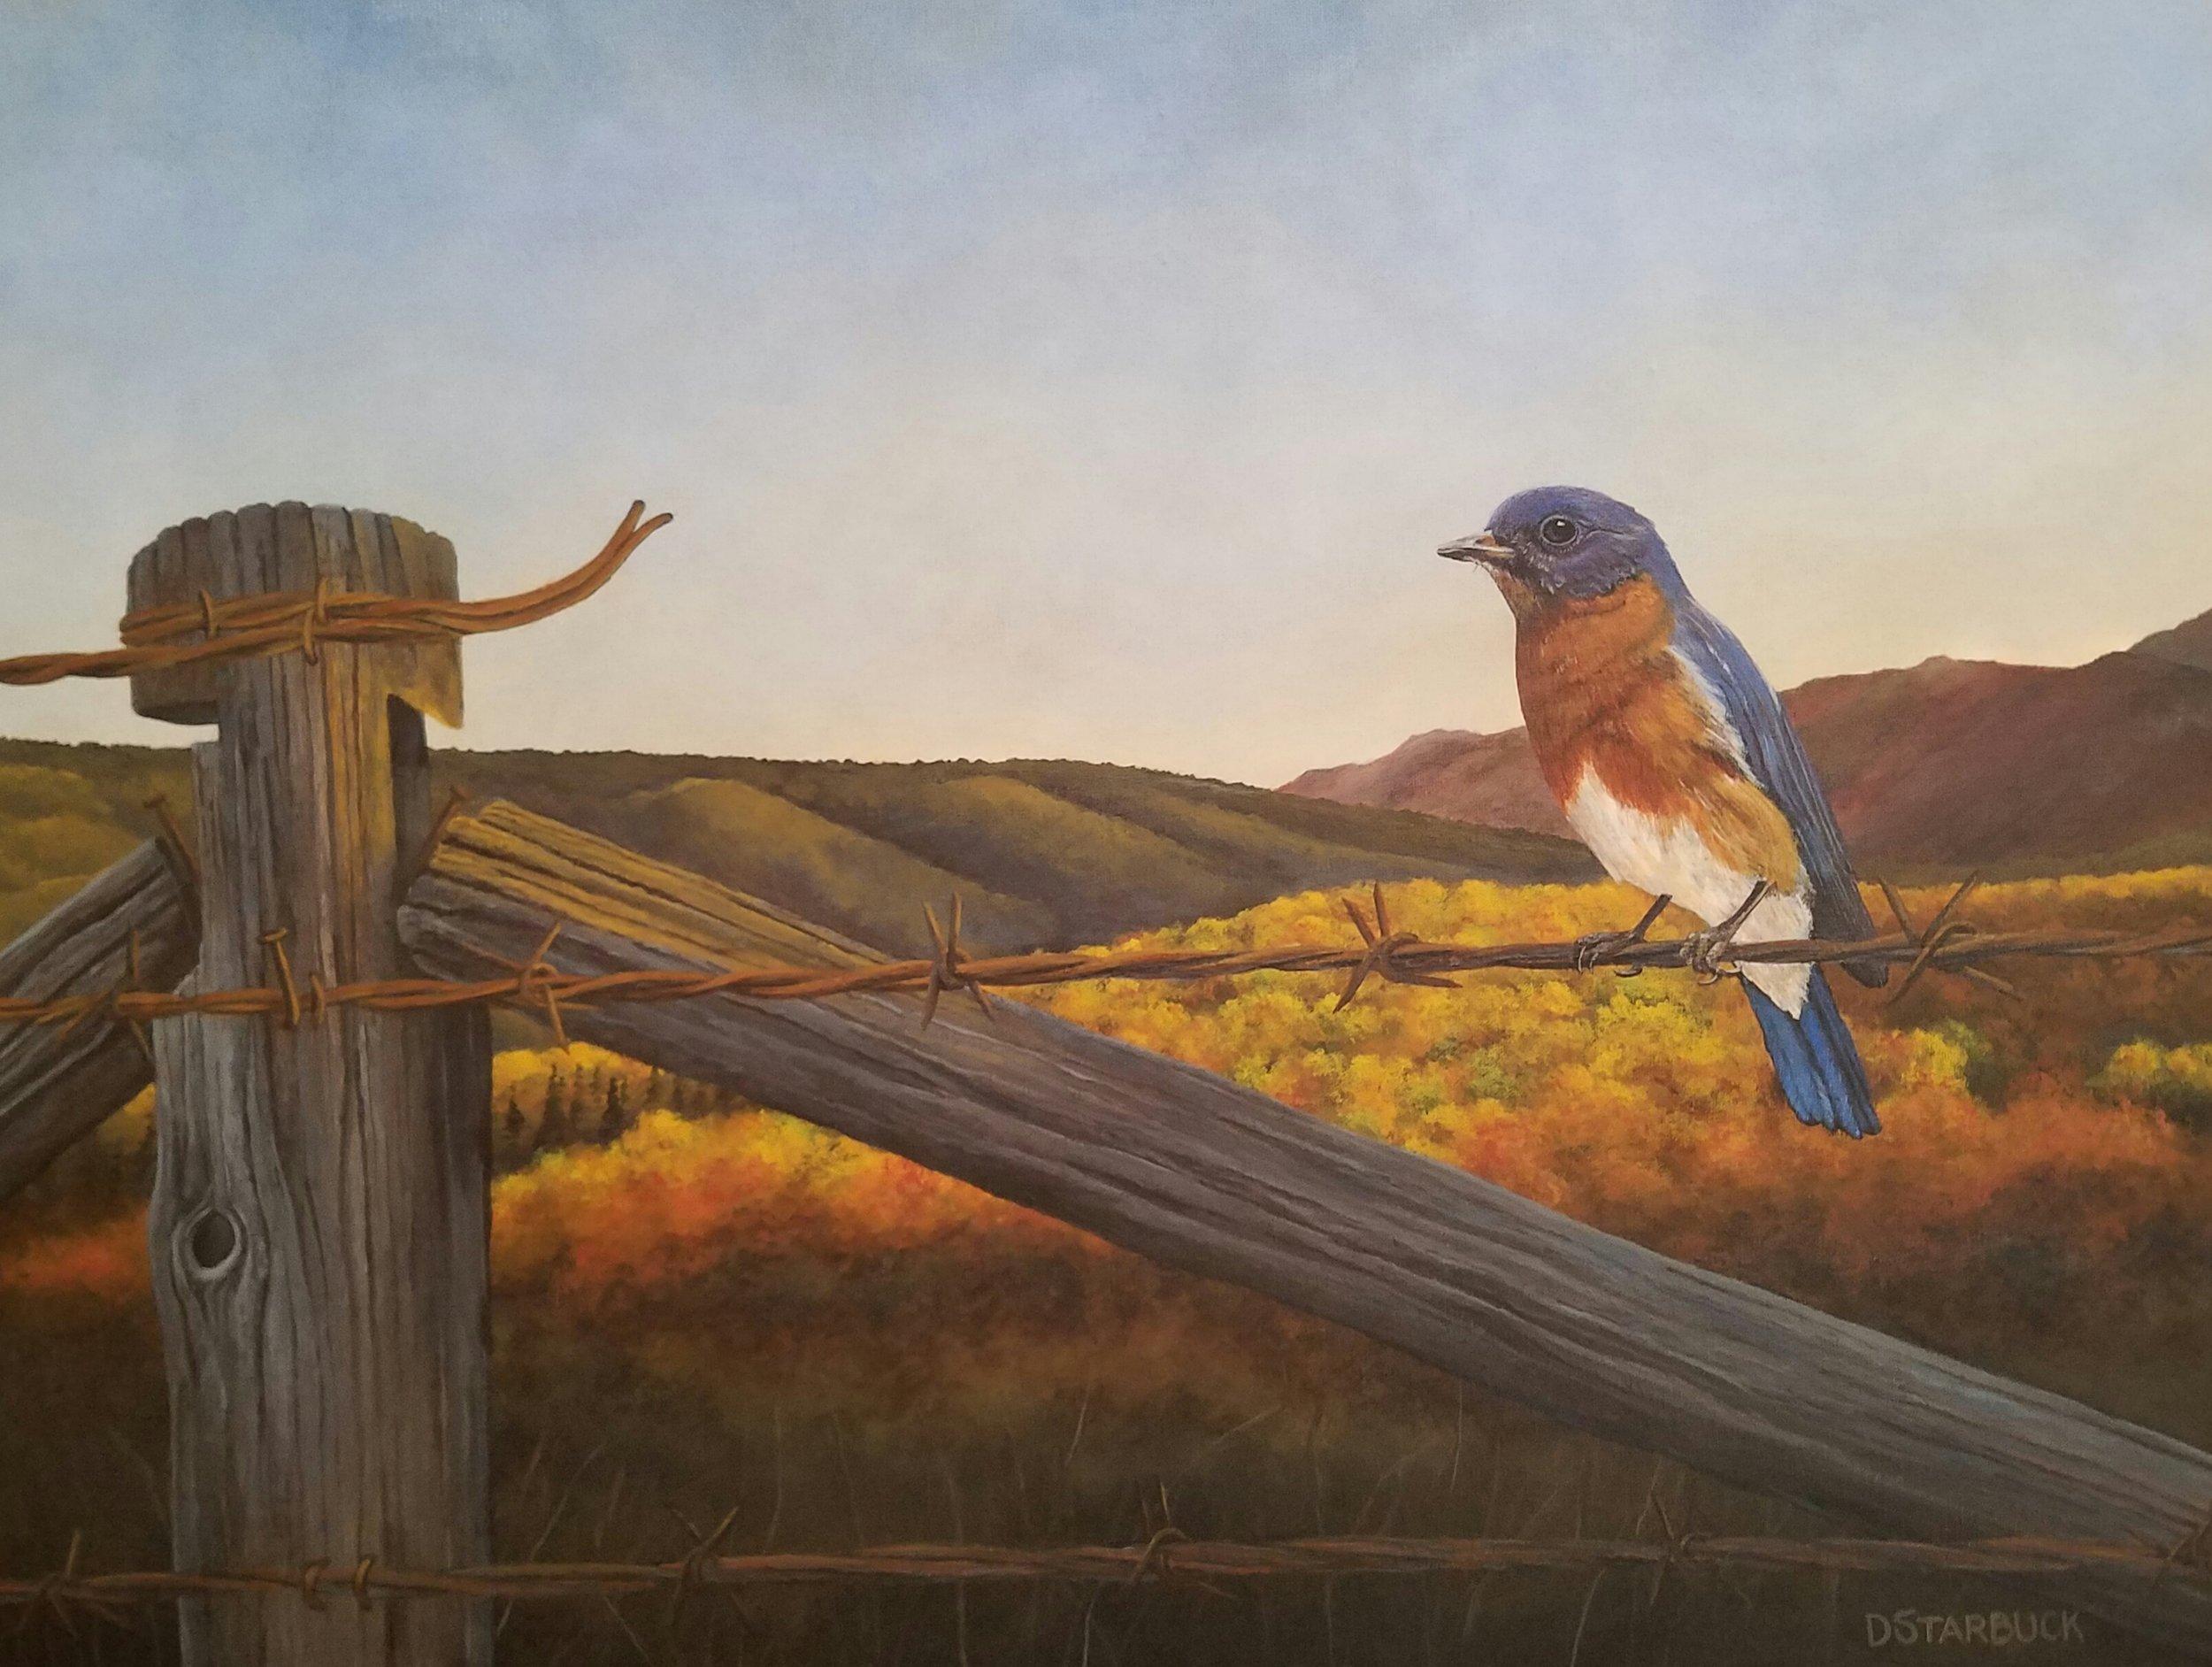 """Blue Ridge Empty Nester"" by David Starbuck"